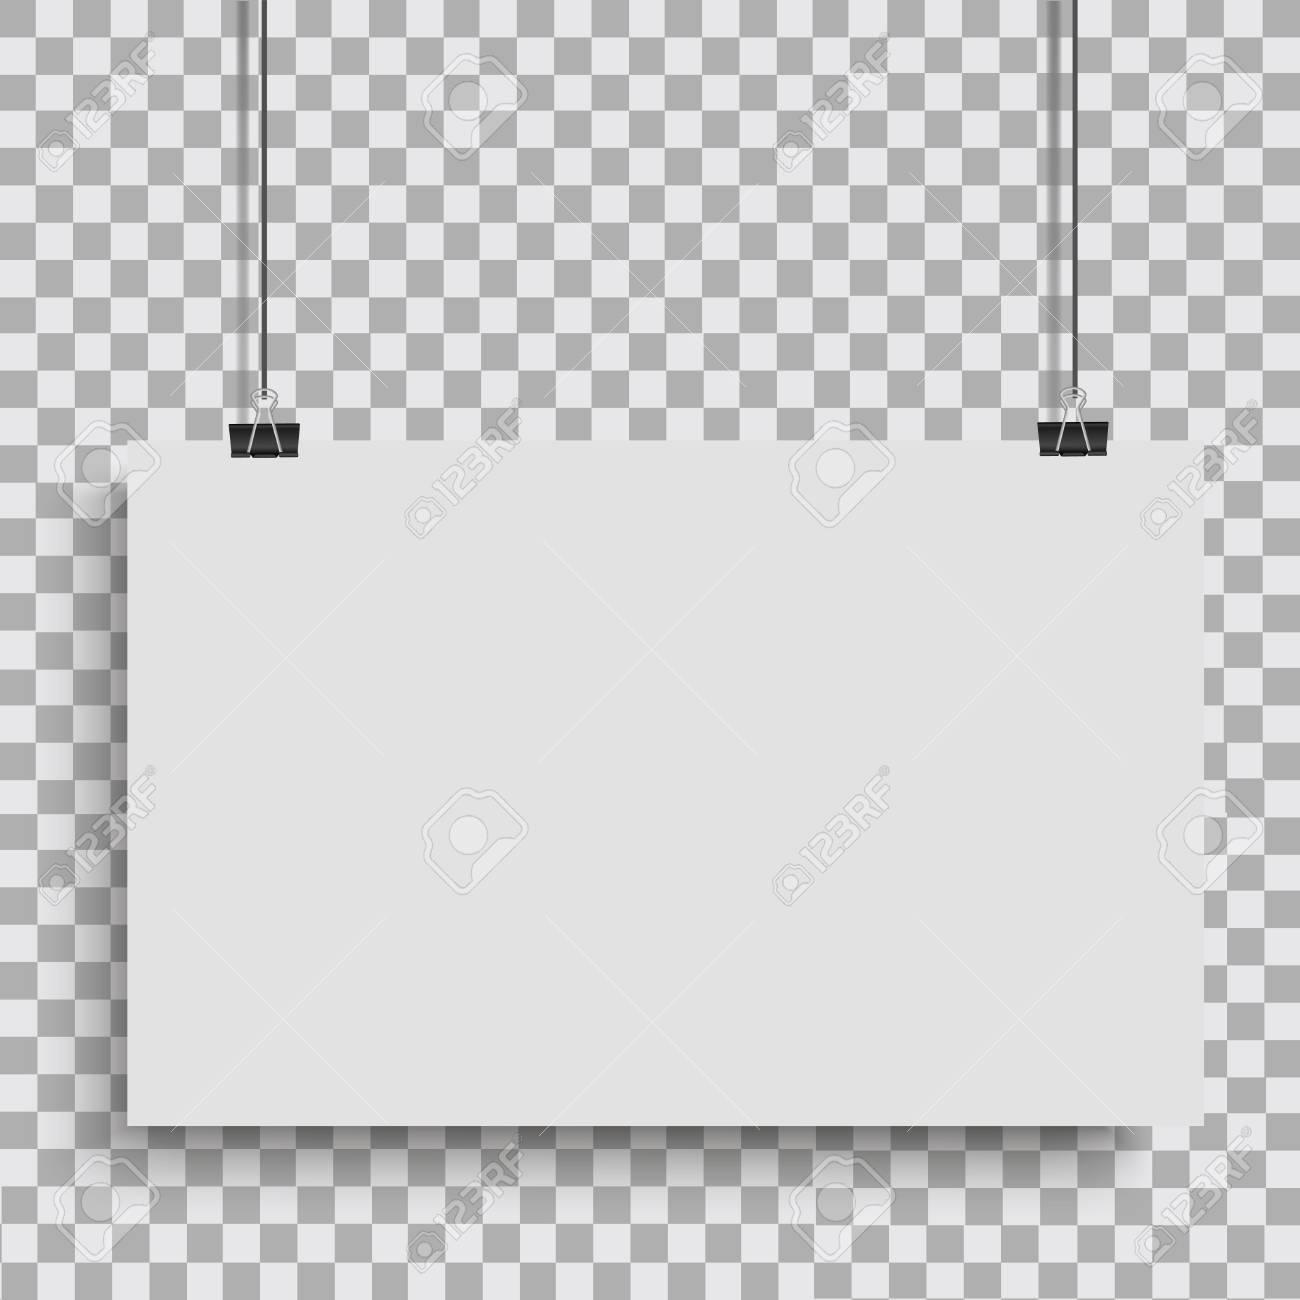 White Poster Hanging On Binder Transparent Background With Mock